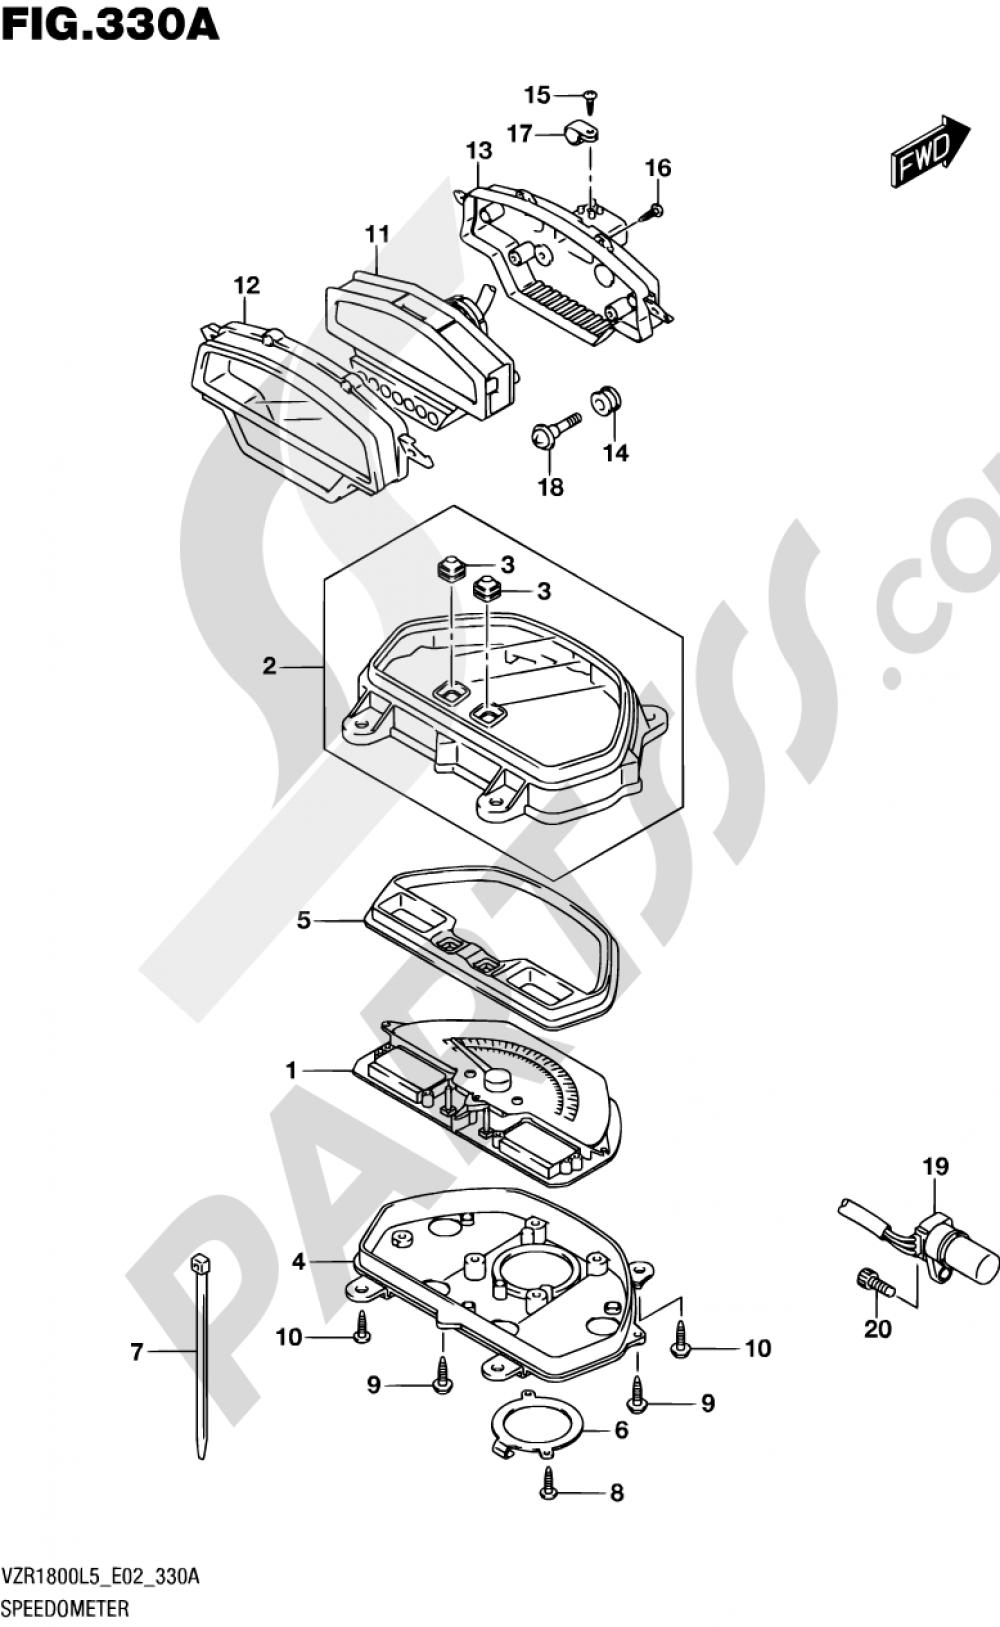 330A - SPEEDOMETER (VZR1800L5 E02) Suzuki VZR1800BZ 2015